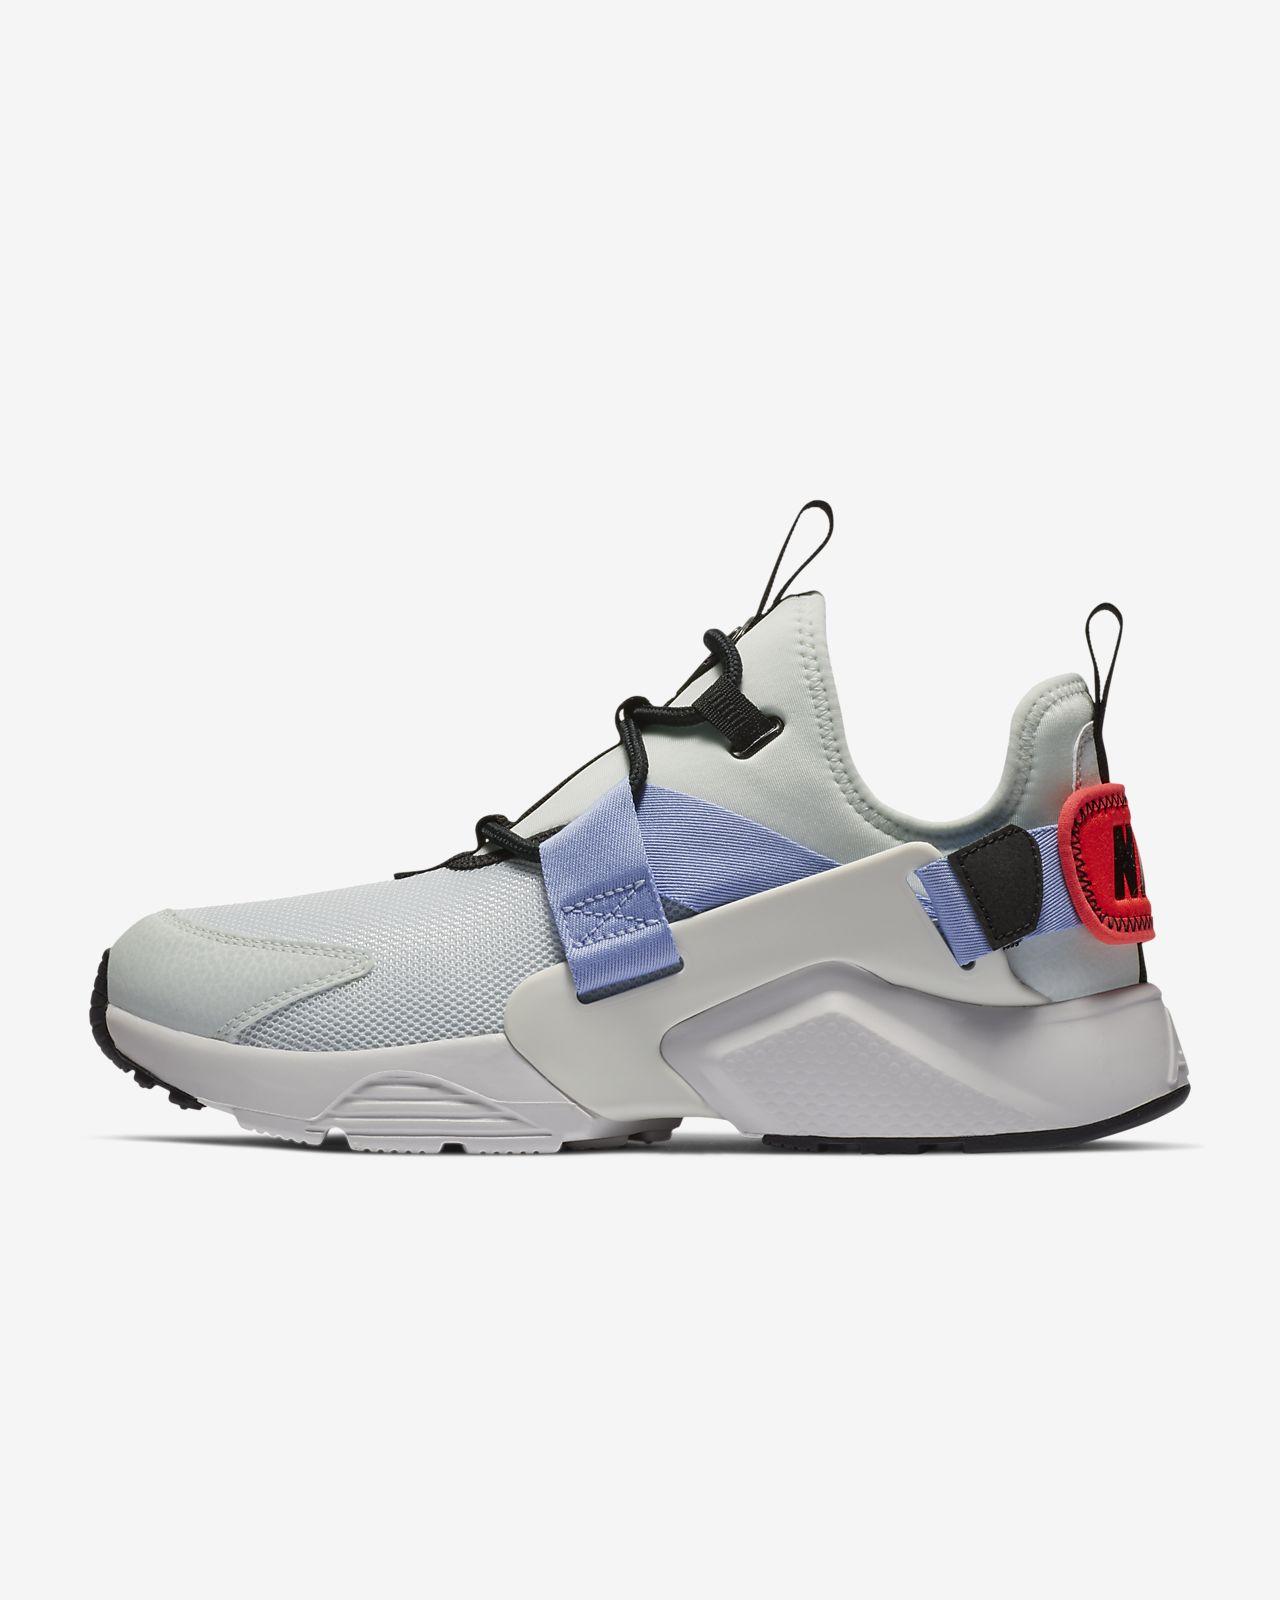 2e9d19000fe3 Nike Air Huarache City Low 女子运动鞋耐克官网中国